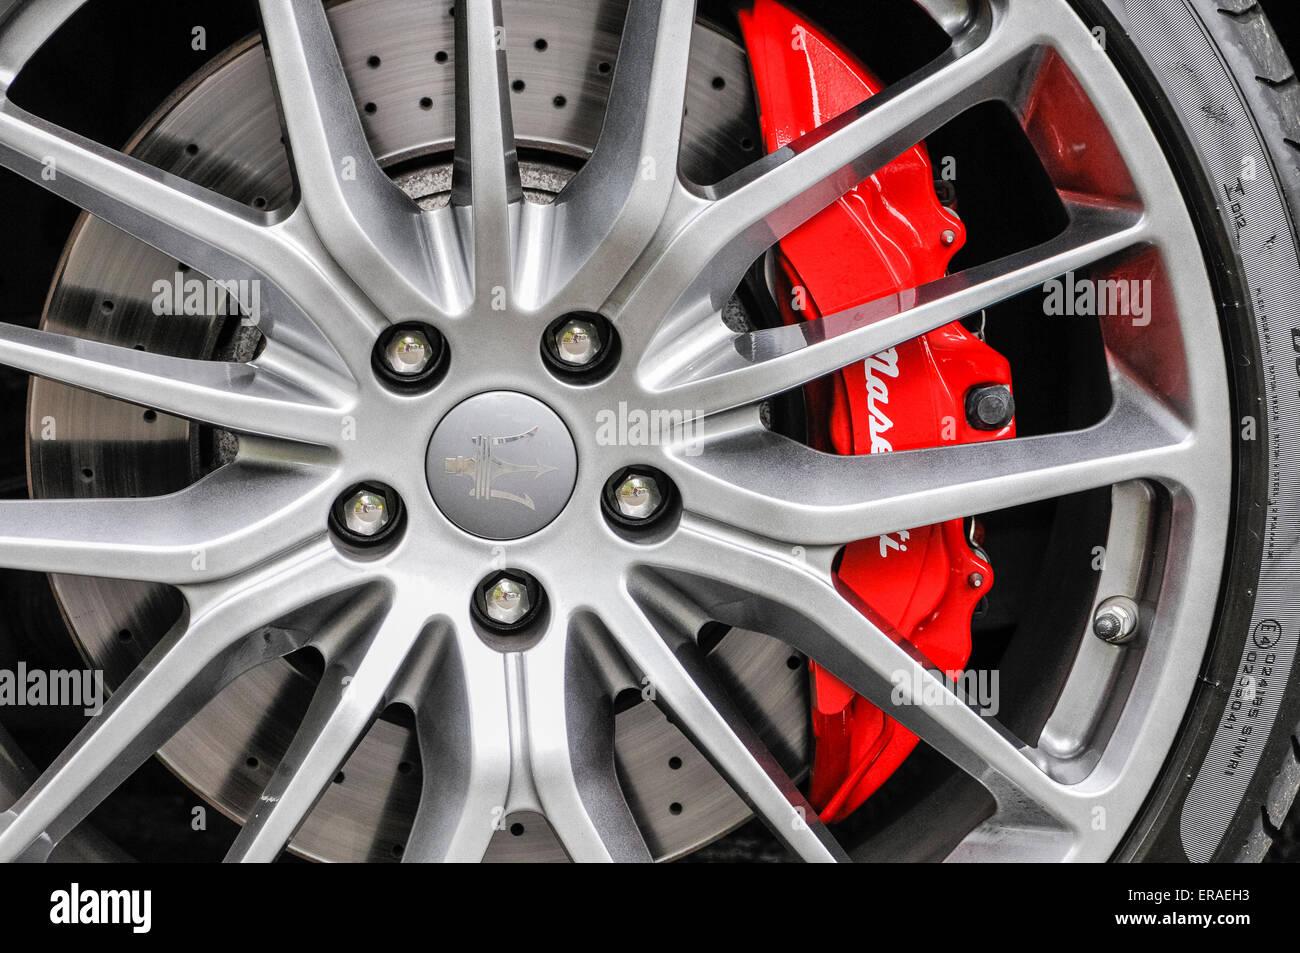 Wheel, disc brakes and brake caliper of a Maserati Gran Tourismo - Stock Image